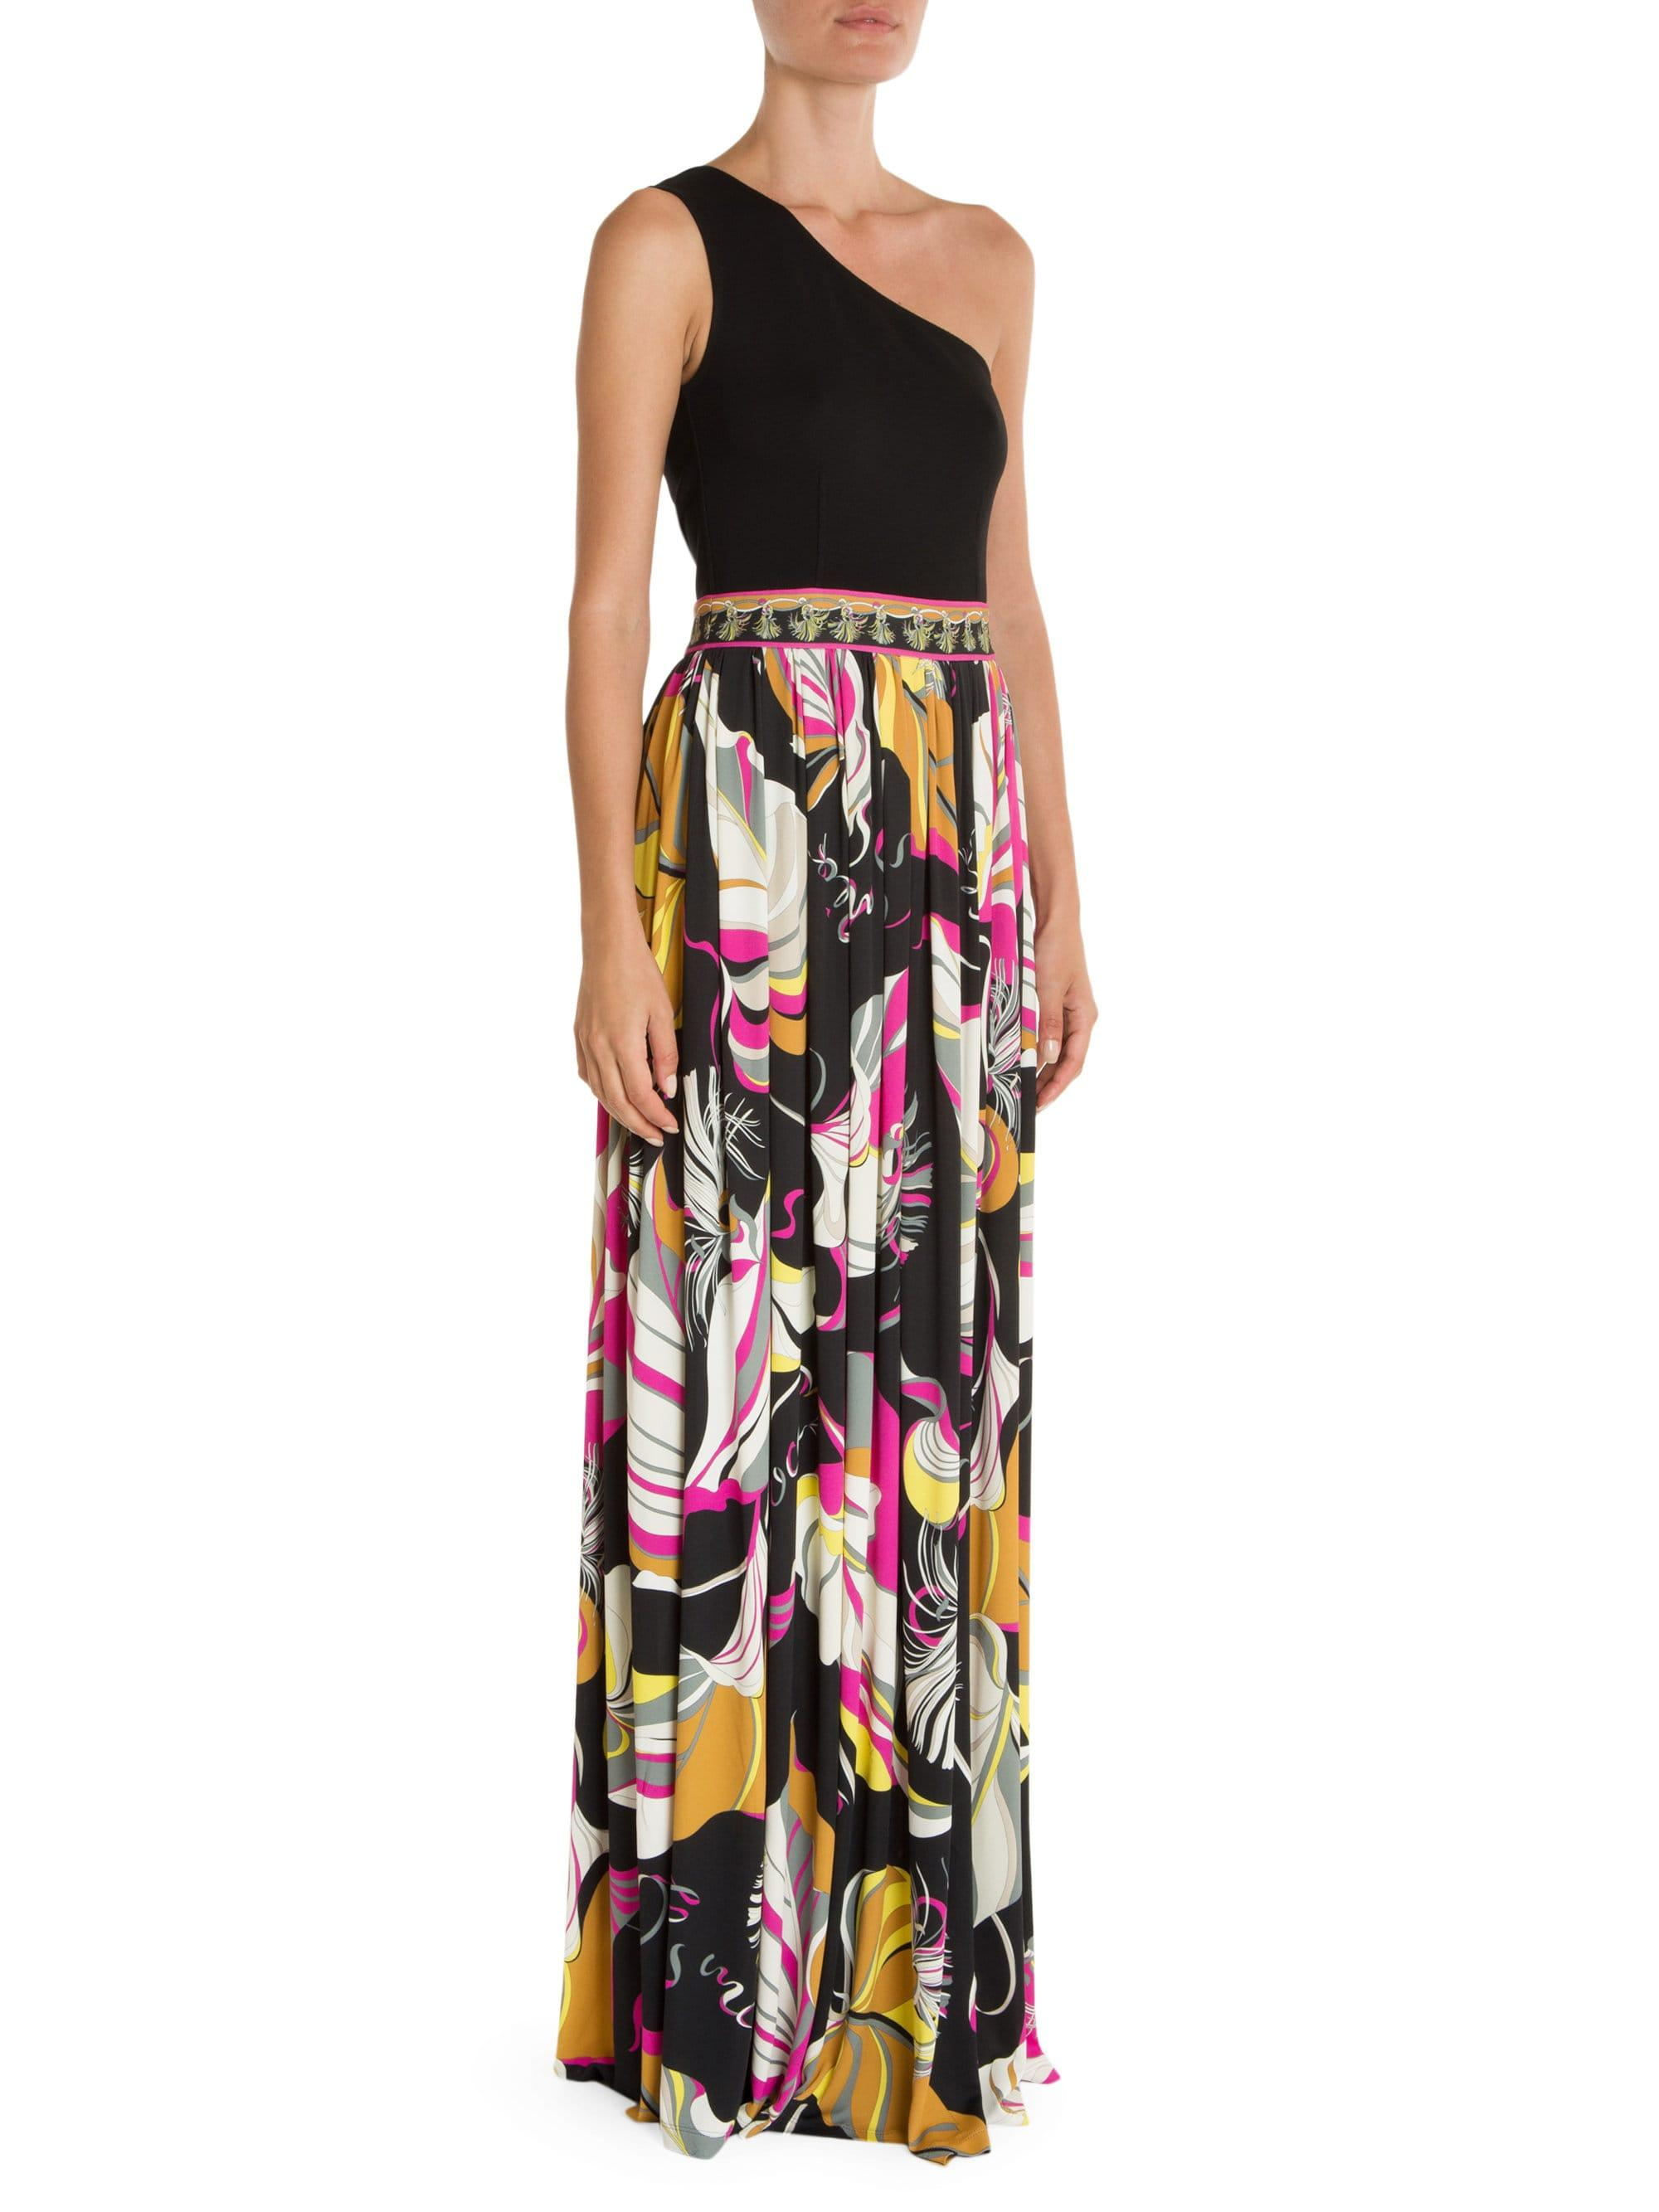 9cd1f78f0a01 Lyst - Emilio Pucci One-shoulder Printed Gown in Black